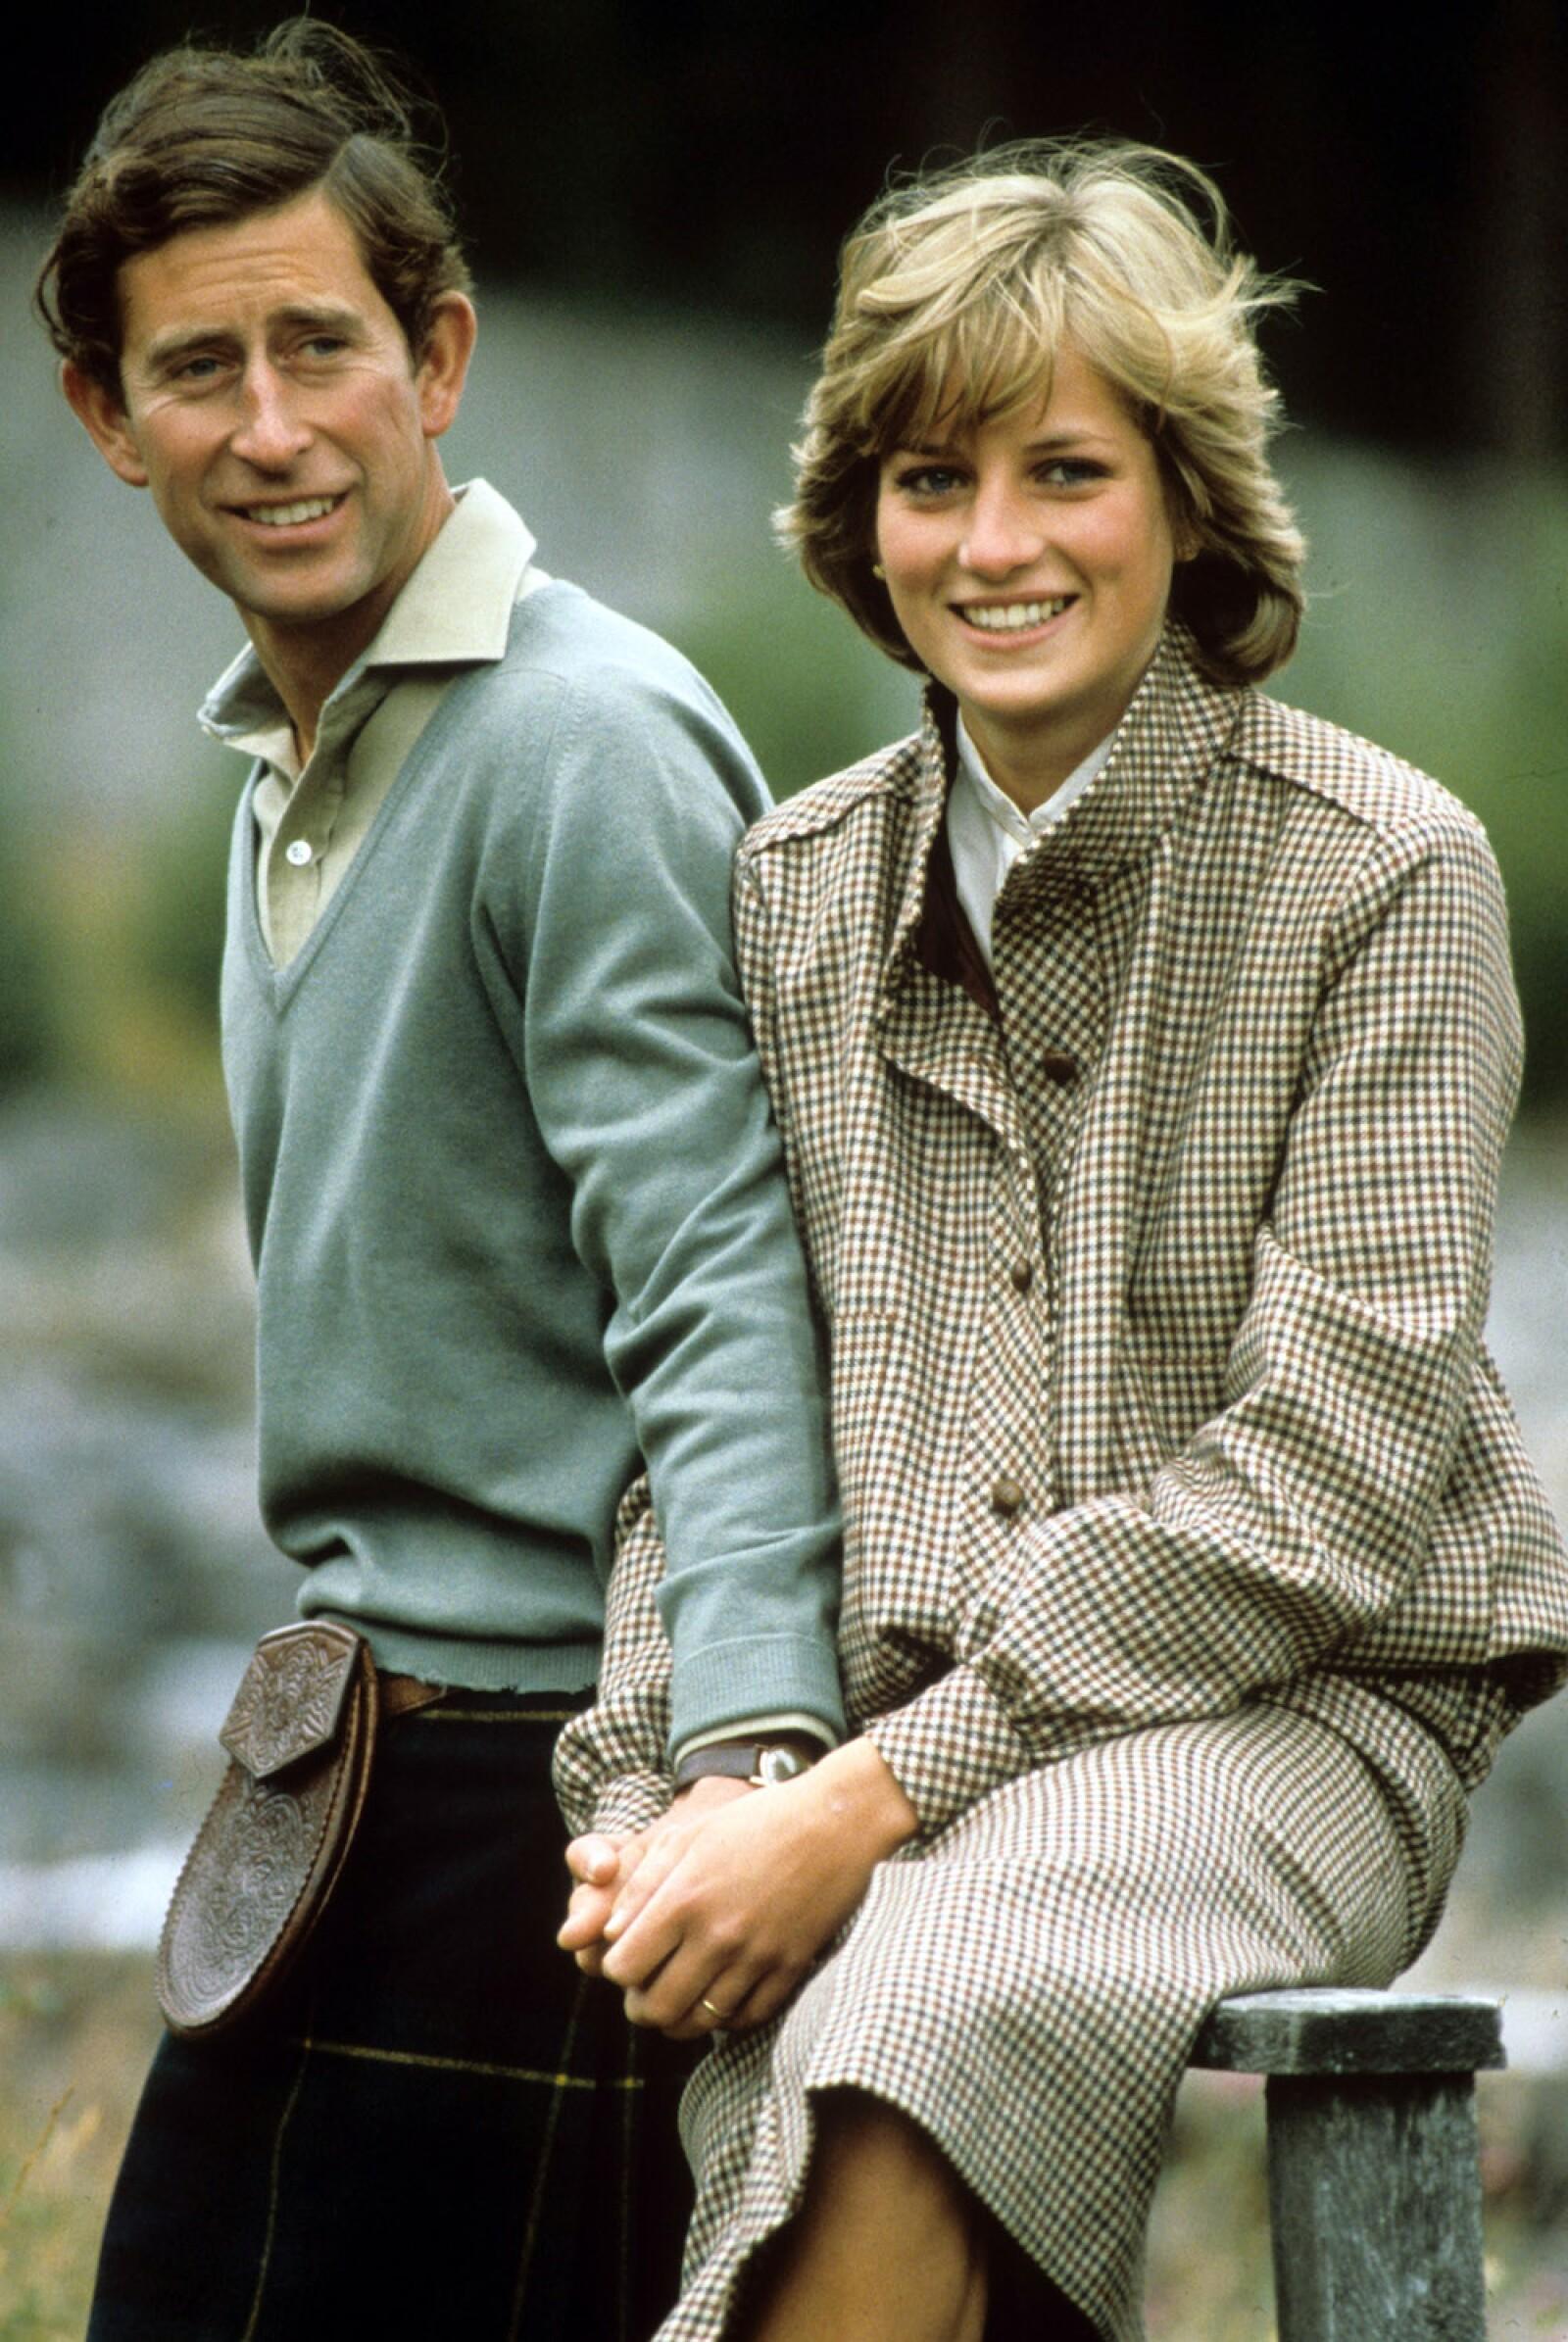 British Royals - 1980s